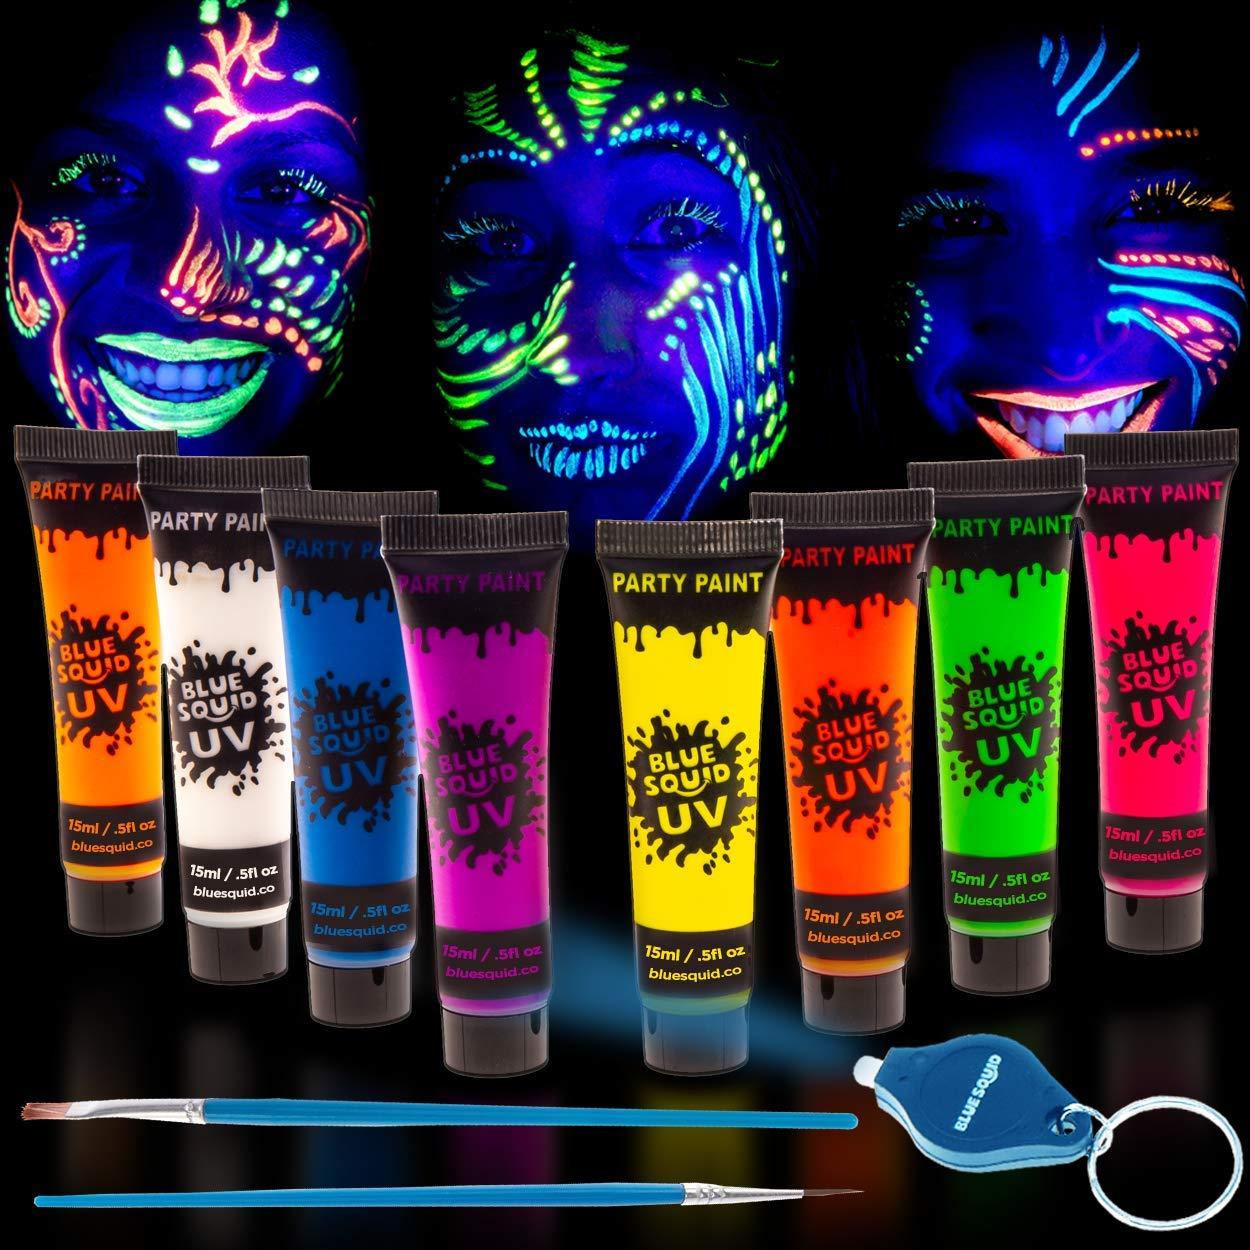 Blue Squid UV Glow in The Dark Face & Body Paint - Set of 8 0.5oz Tubes Black Light Reactive Neon Liquid Paints